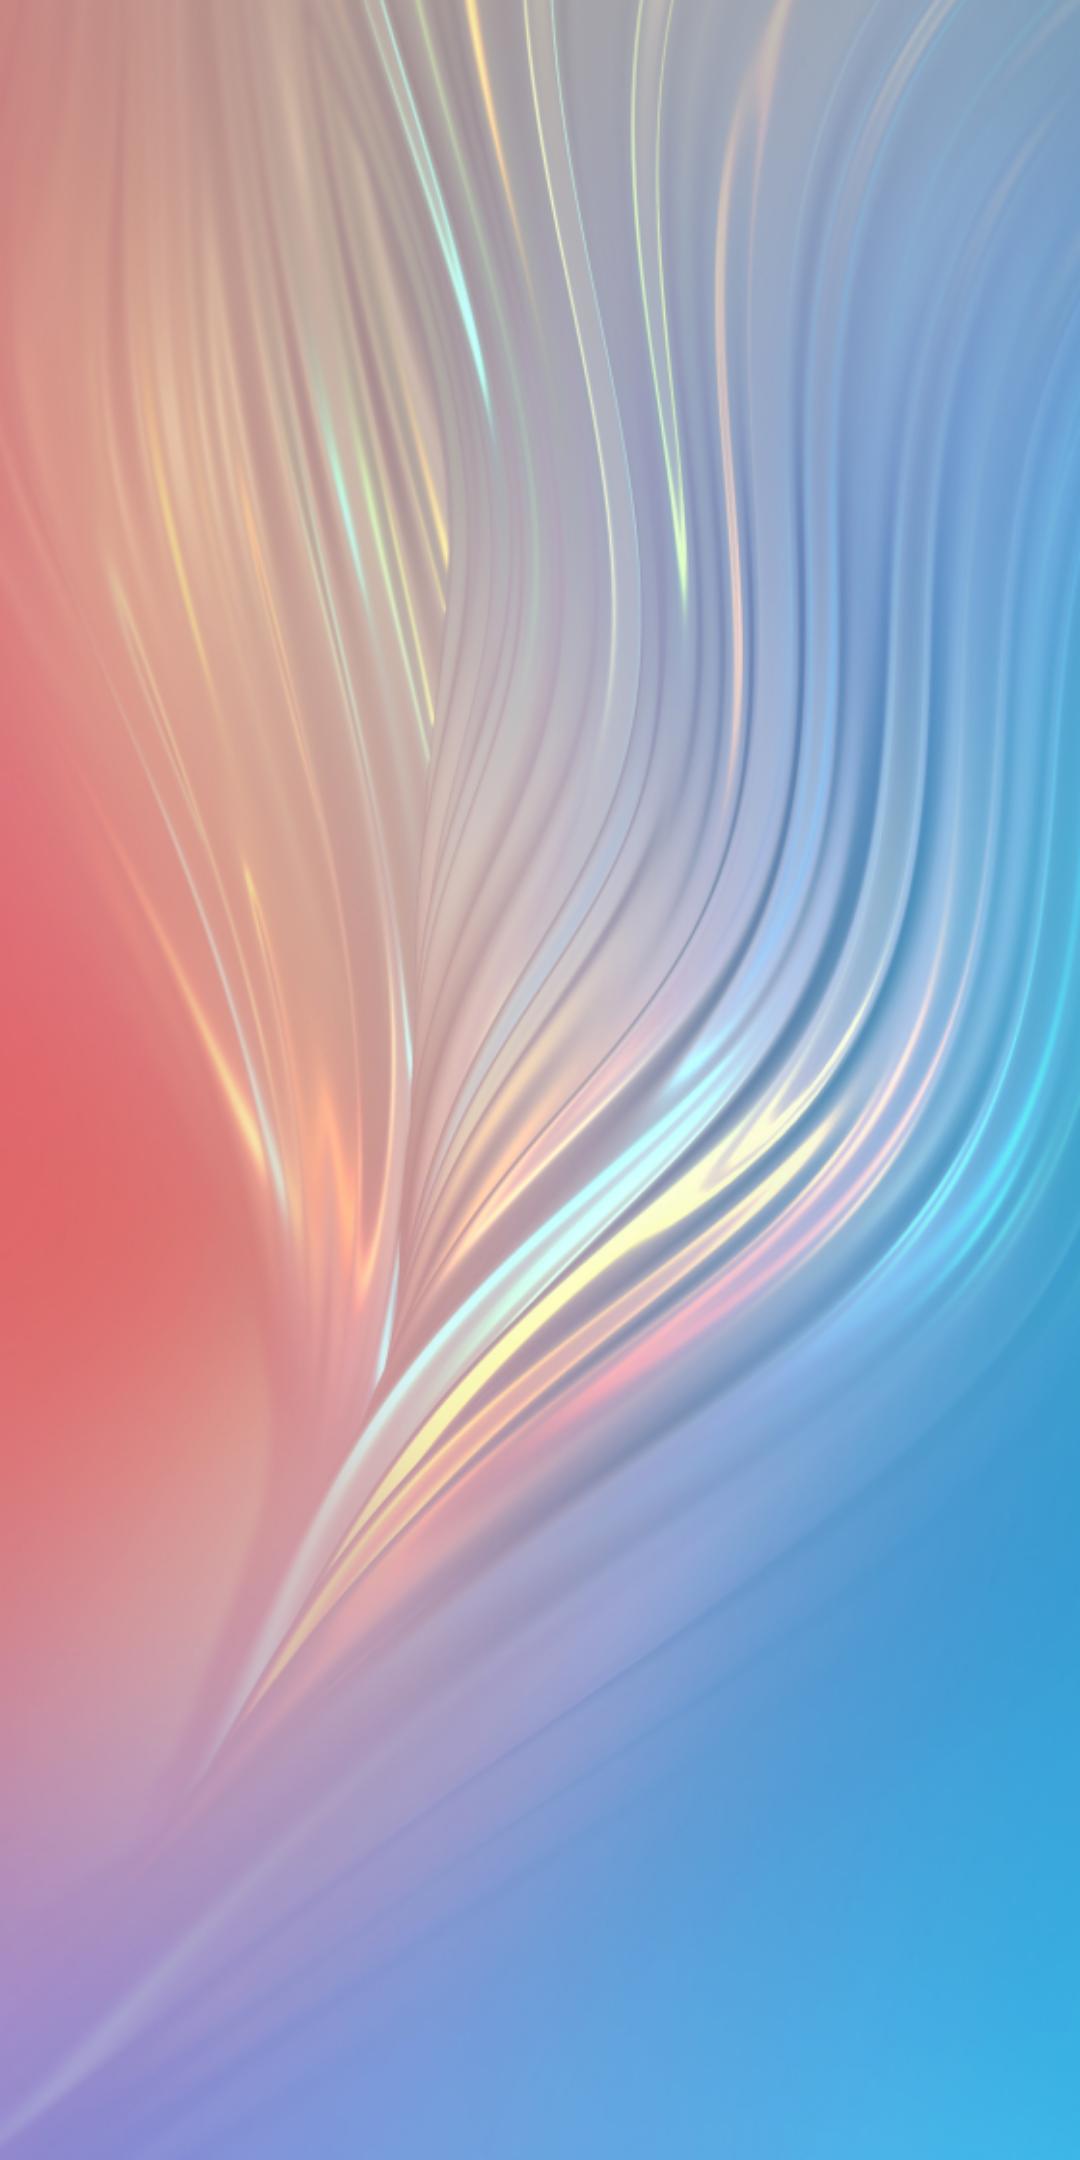 Image Result For Anime Wallpaper Blue